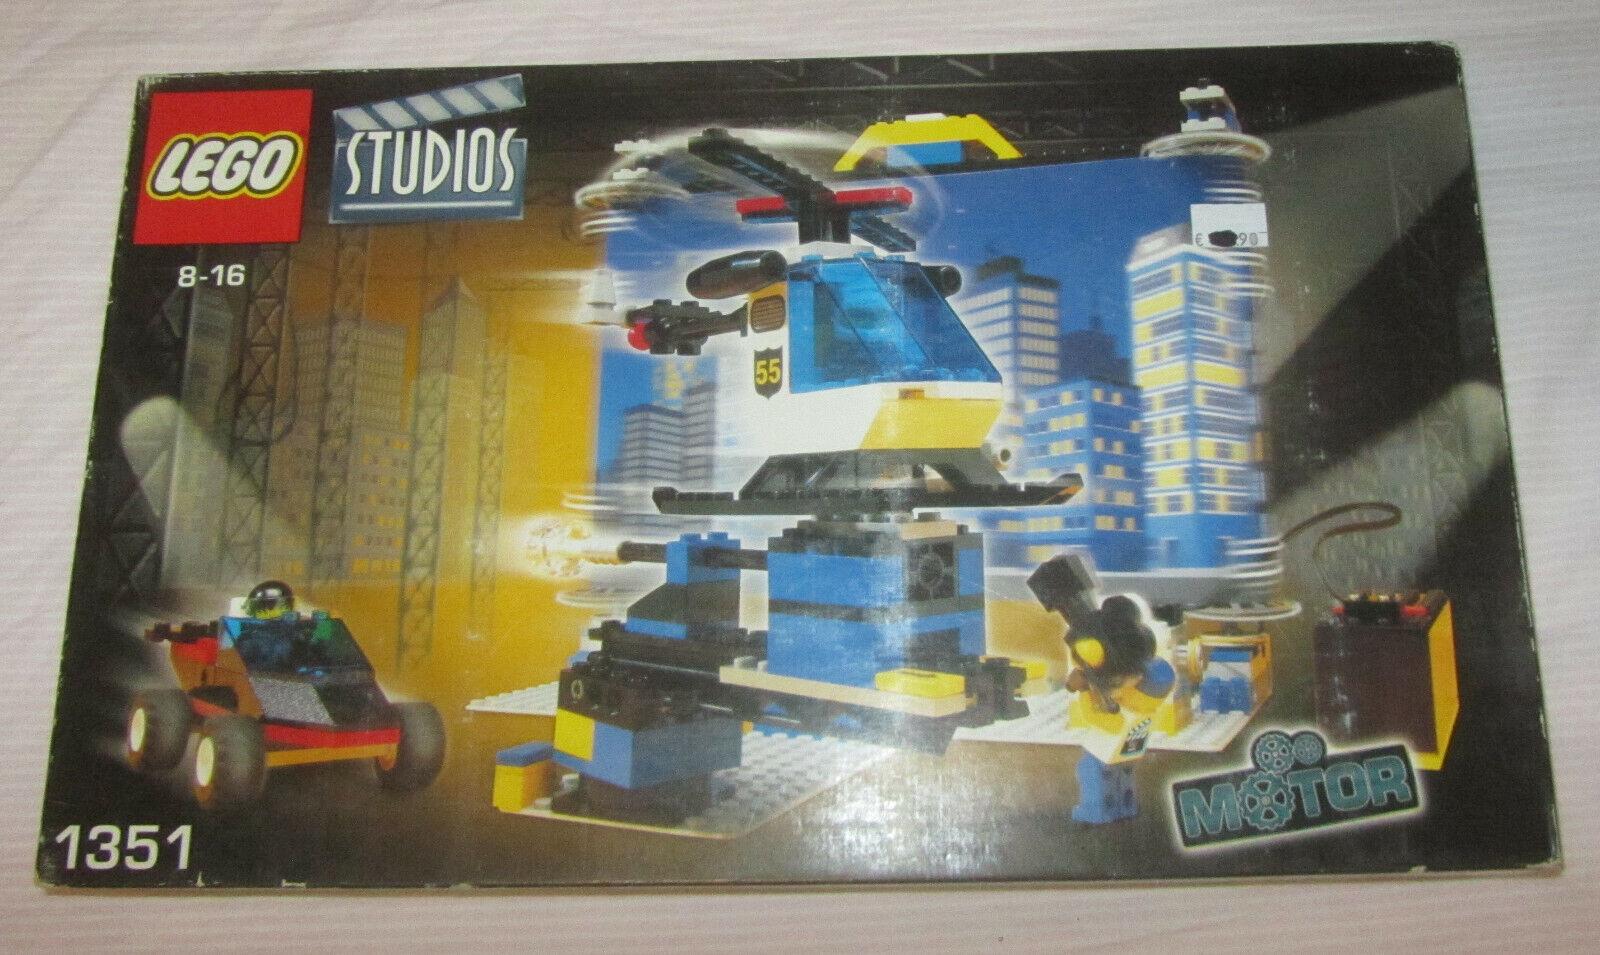 LEGO Studios 1351 Film Sfondo Moving Backdrop Studio Motor Sigillat SPESE GRATIS